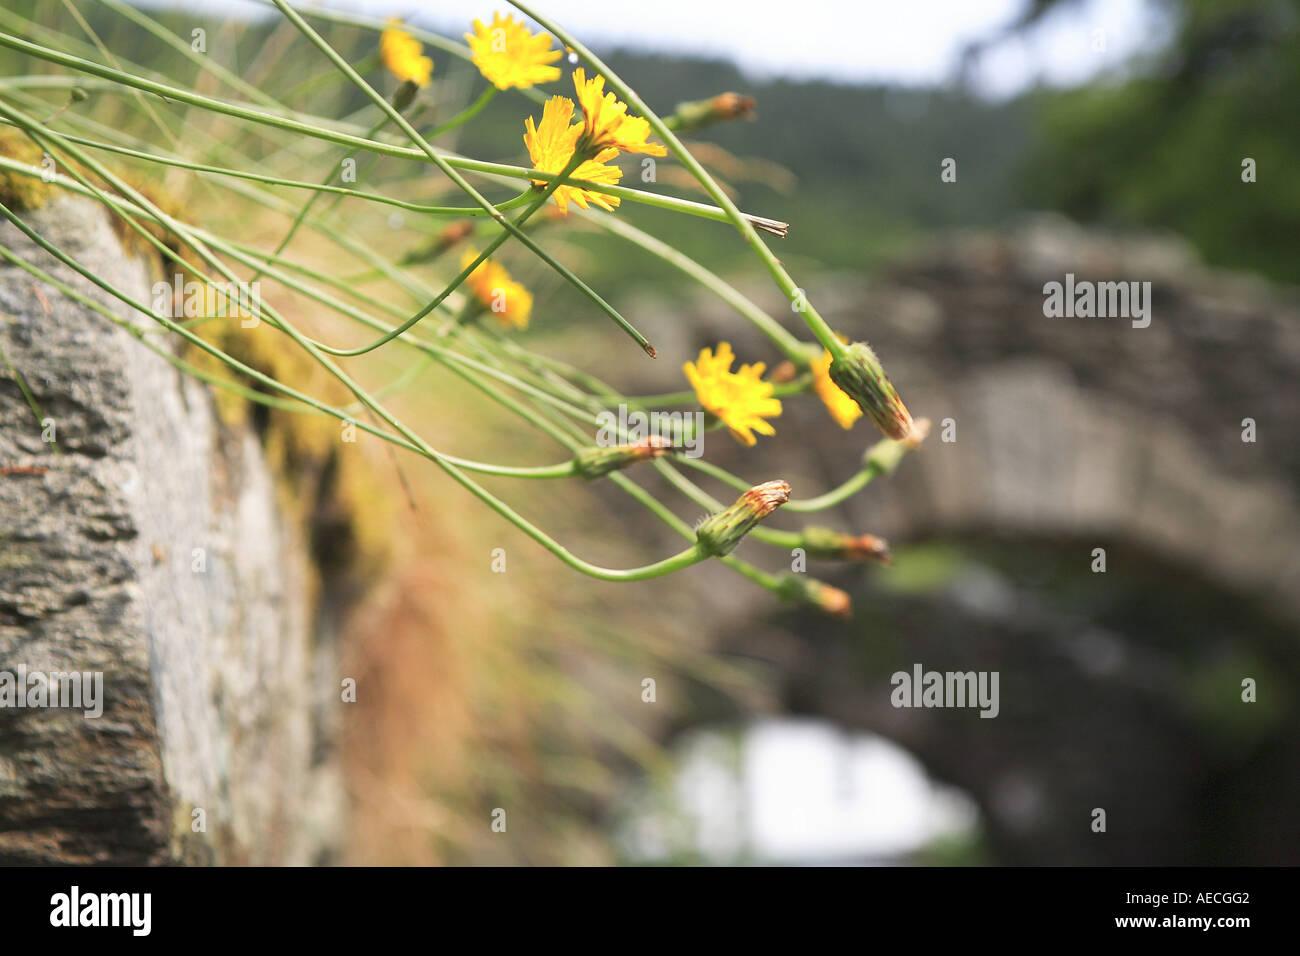 Yellow Flowers Glendalough Wicklow Ireland Stock Photo 7794689 Alamy